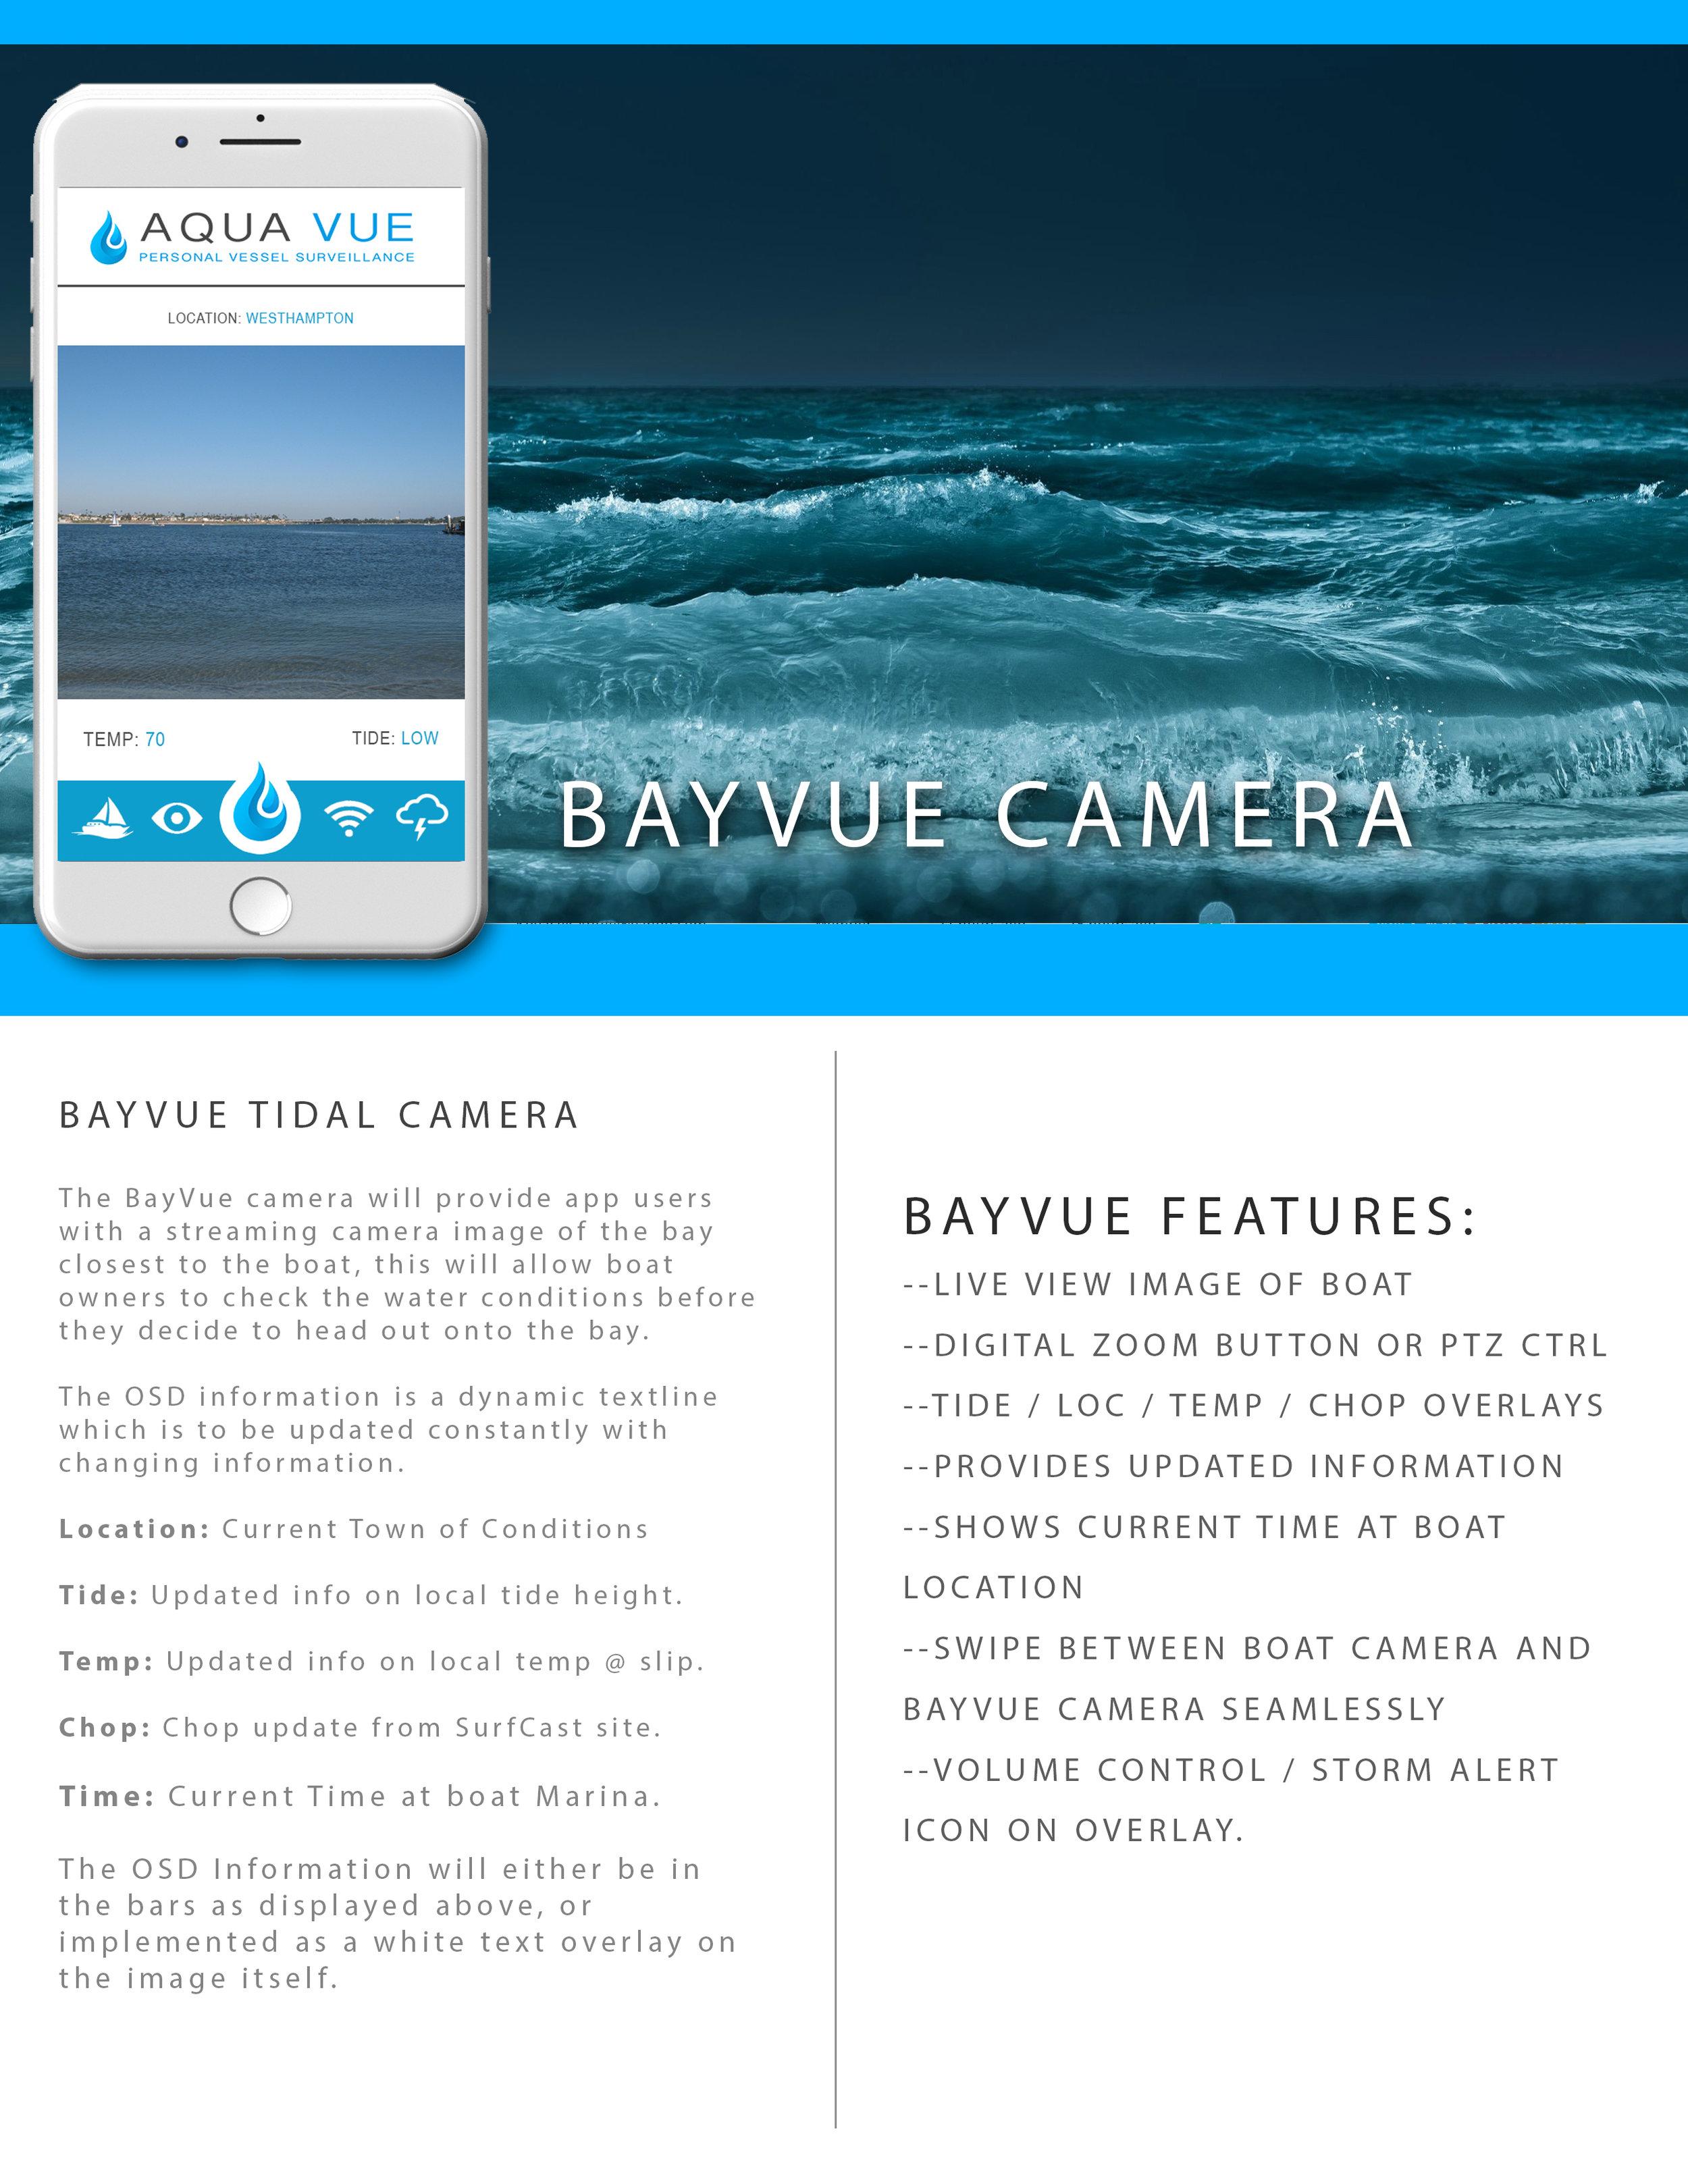 8-Aquavue Specs - BayVue.jpg